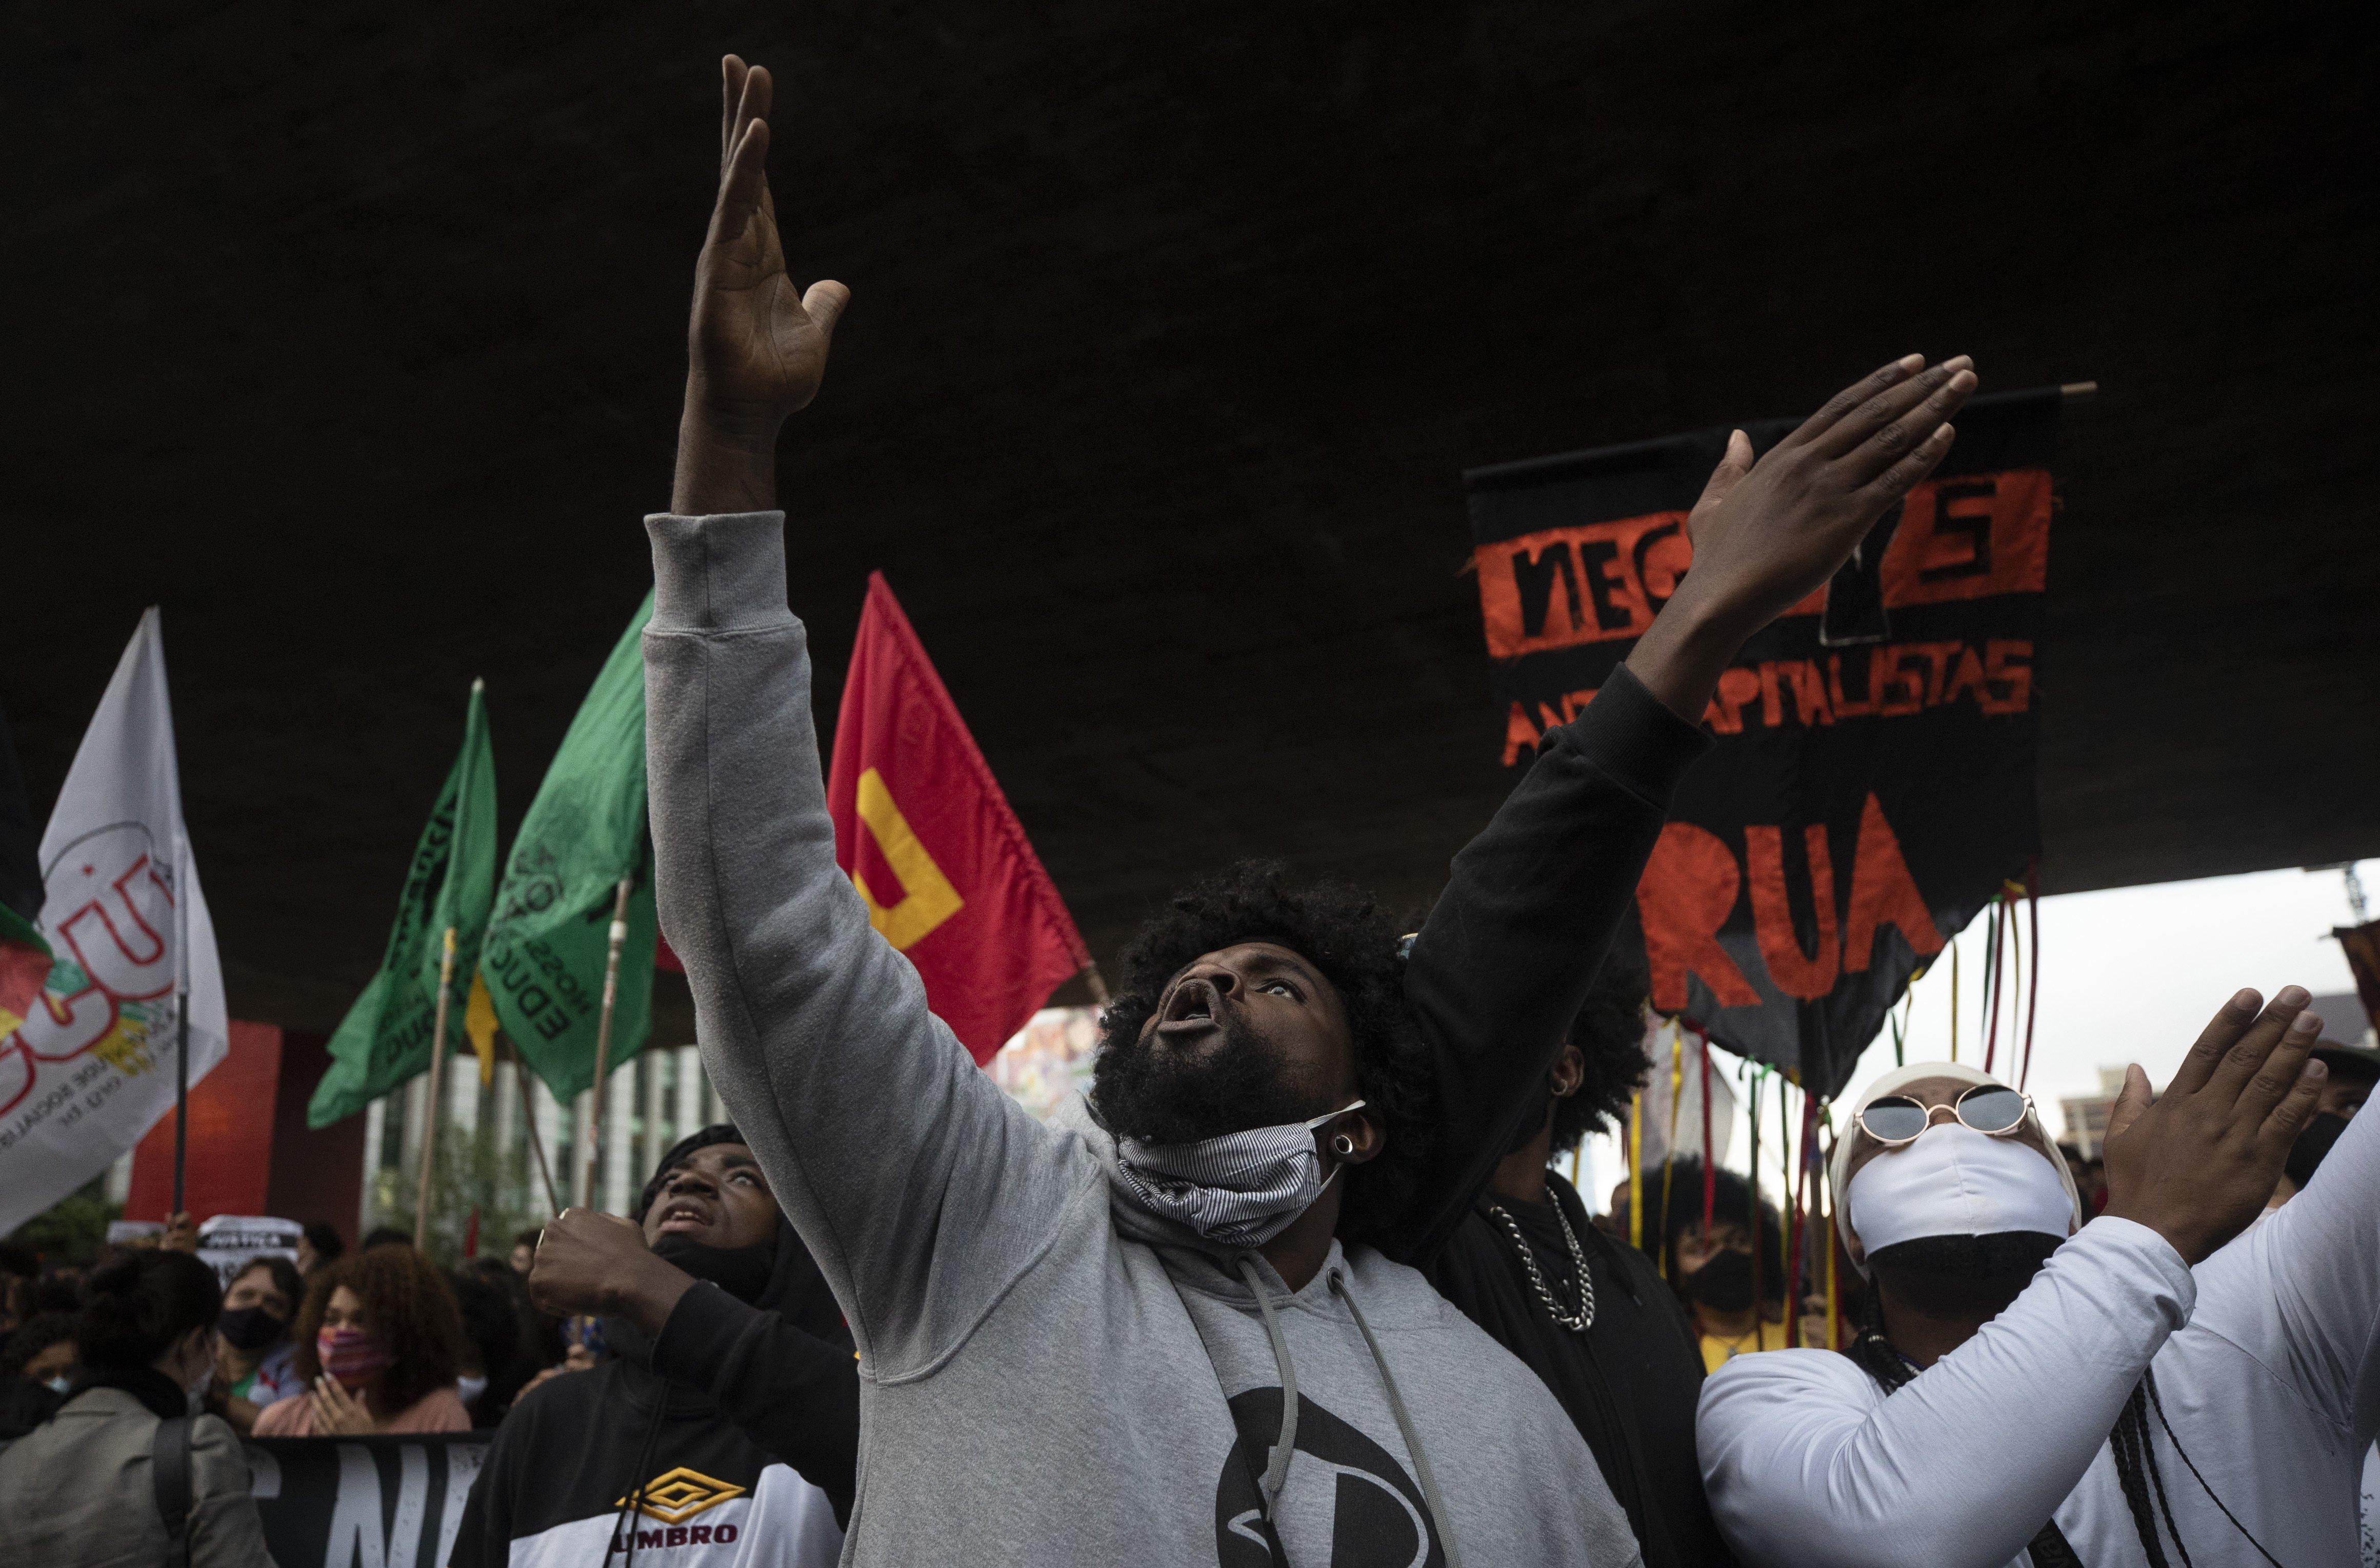 Protest in Brazil following murder of João Alberto Silveira Freitas